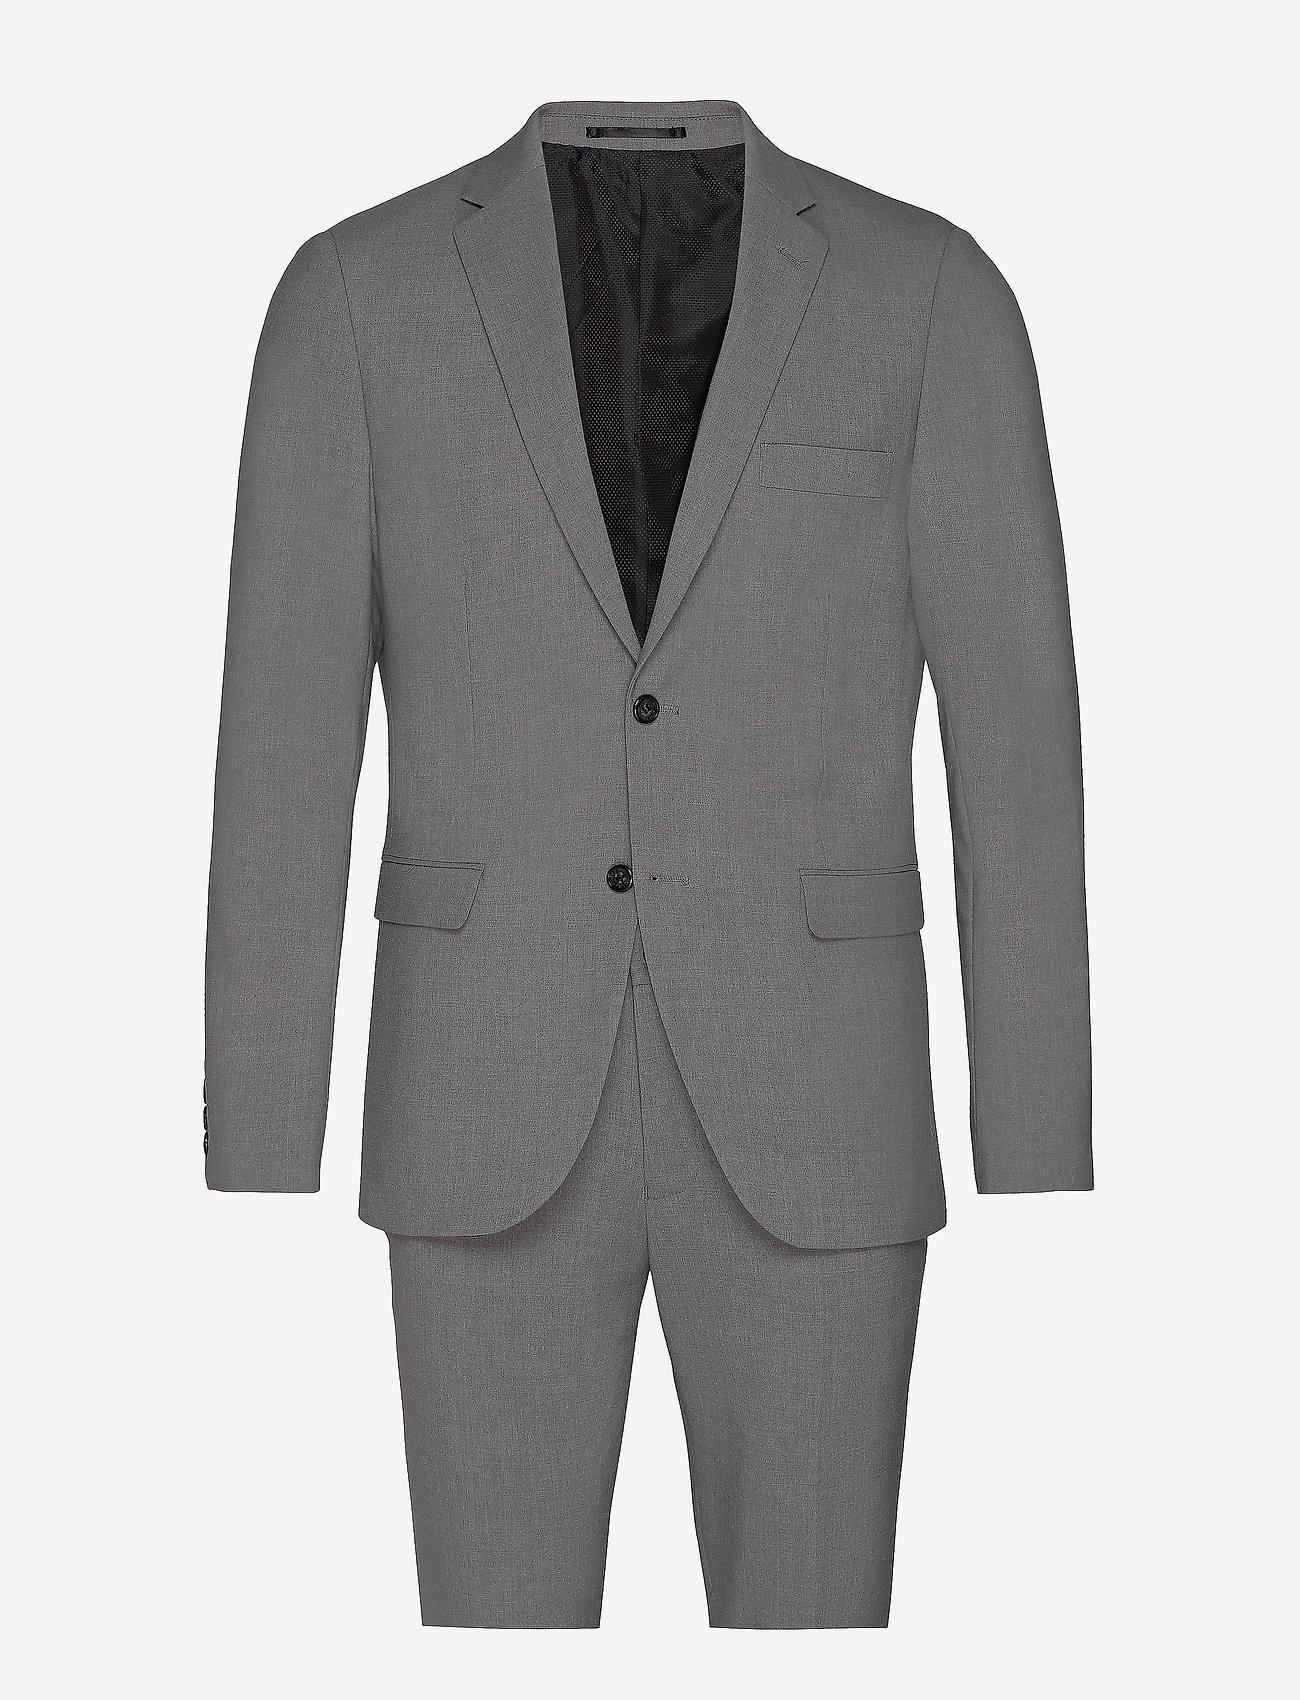 Lindbergh - Plain mens suit - yksiriviset puvut - lt grey mel - 1